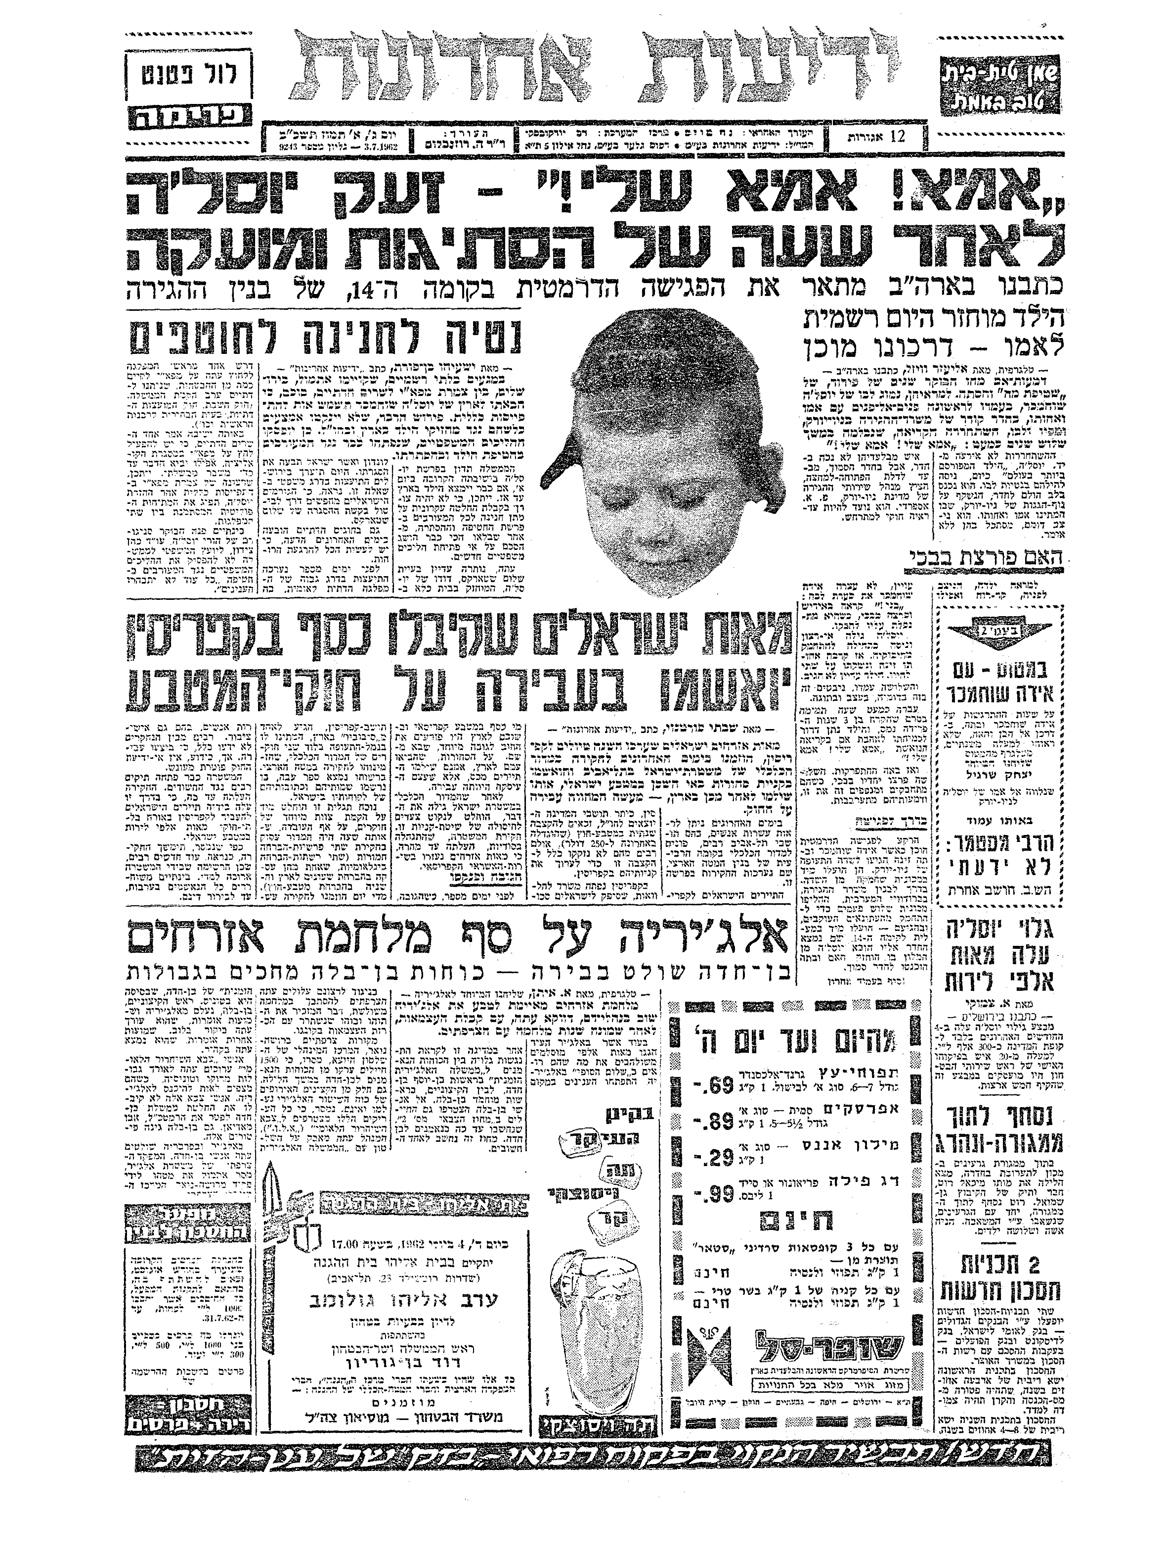 3.7.1962